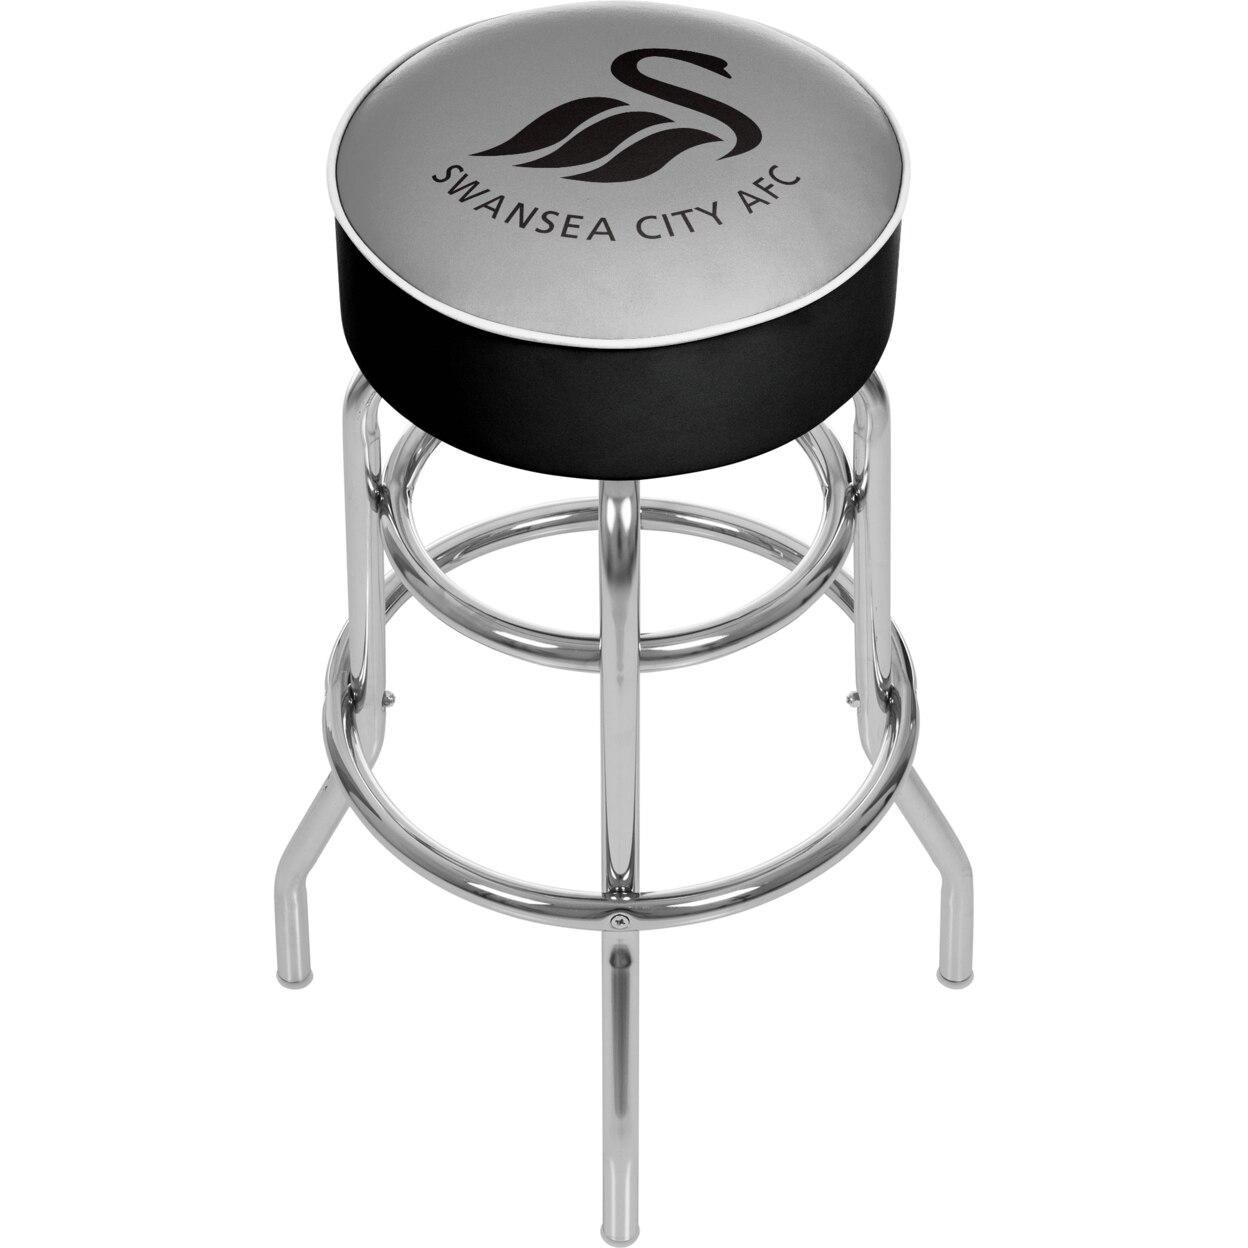 Premier League Swansea City Padded Swivel Bar Stool 30 Inches High stoke city swansea